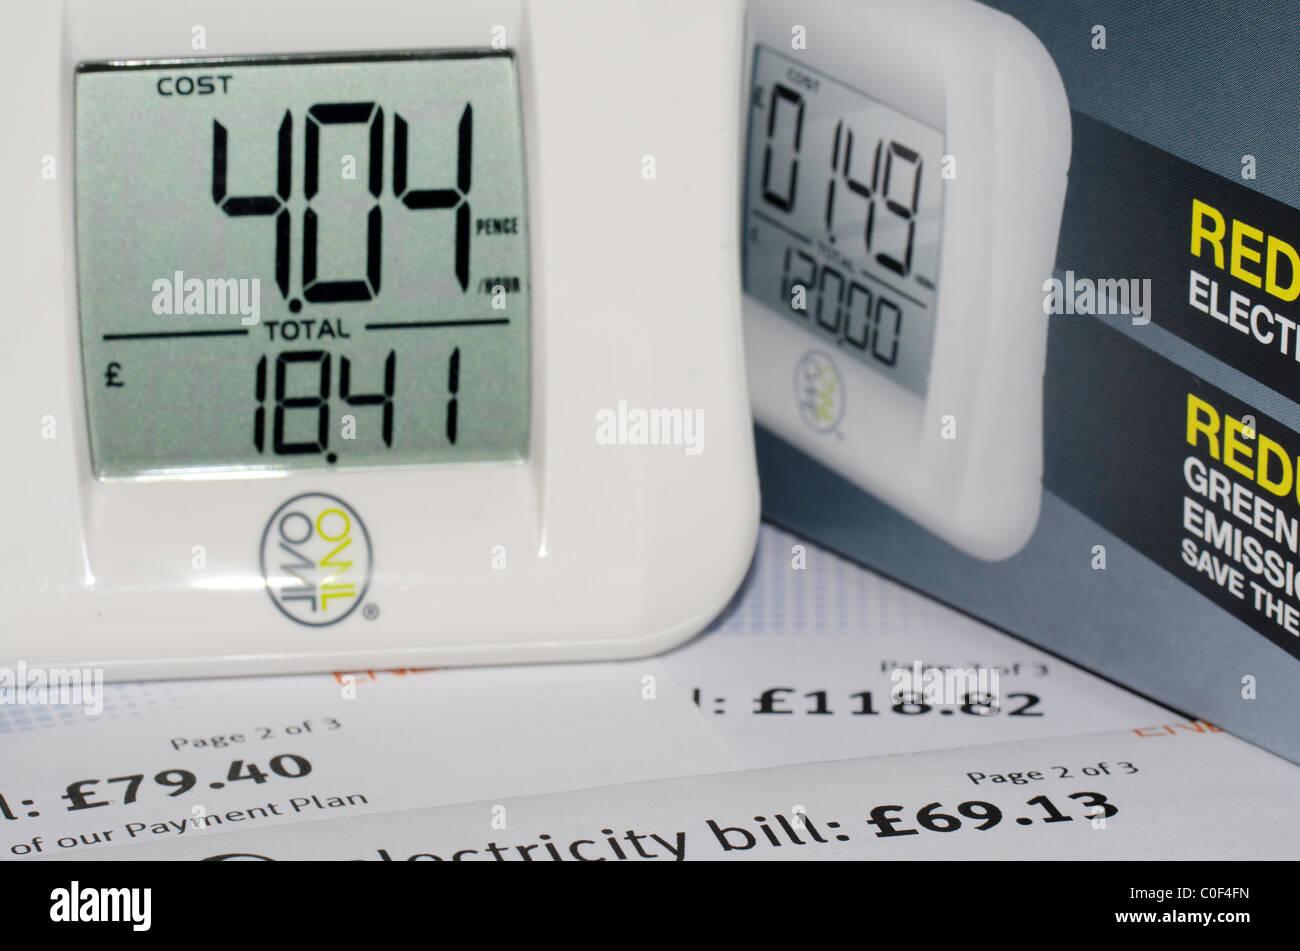 owl energy monitor cm130 instructions